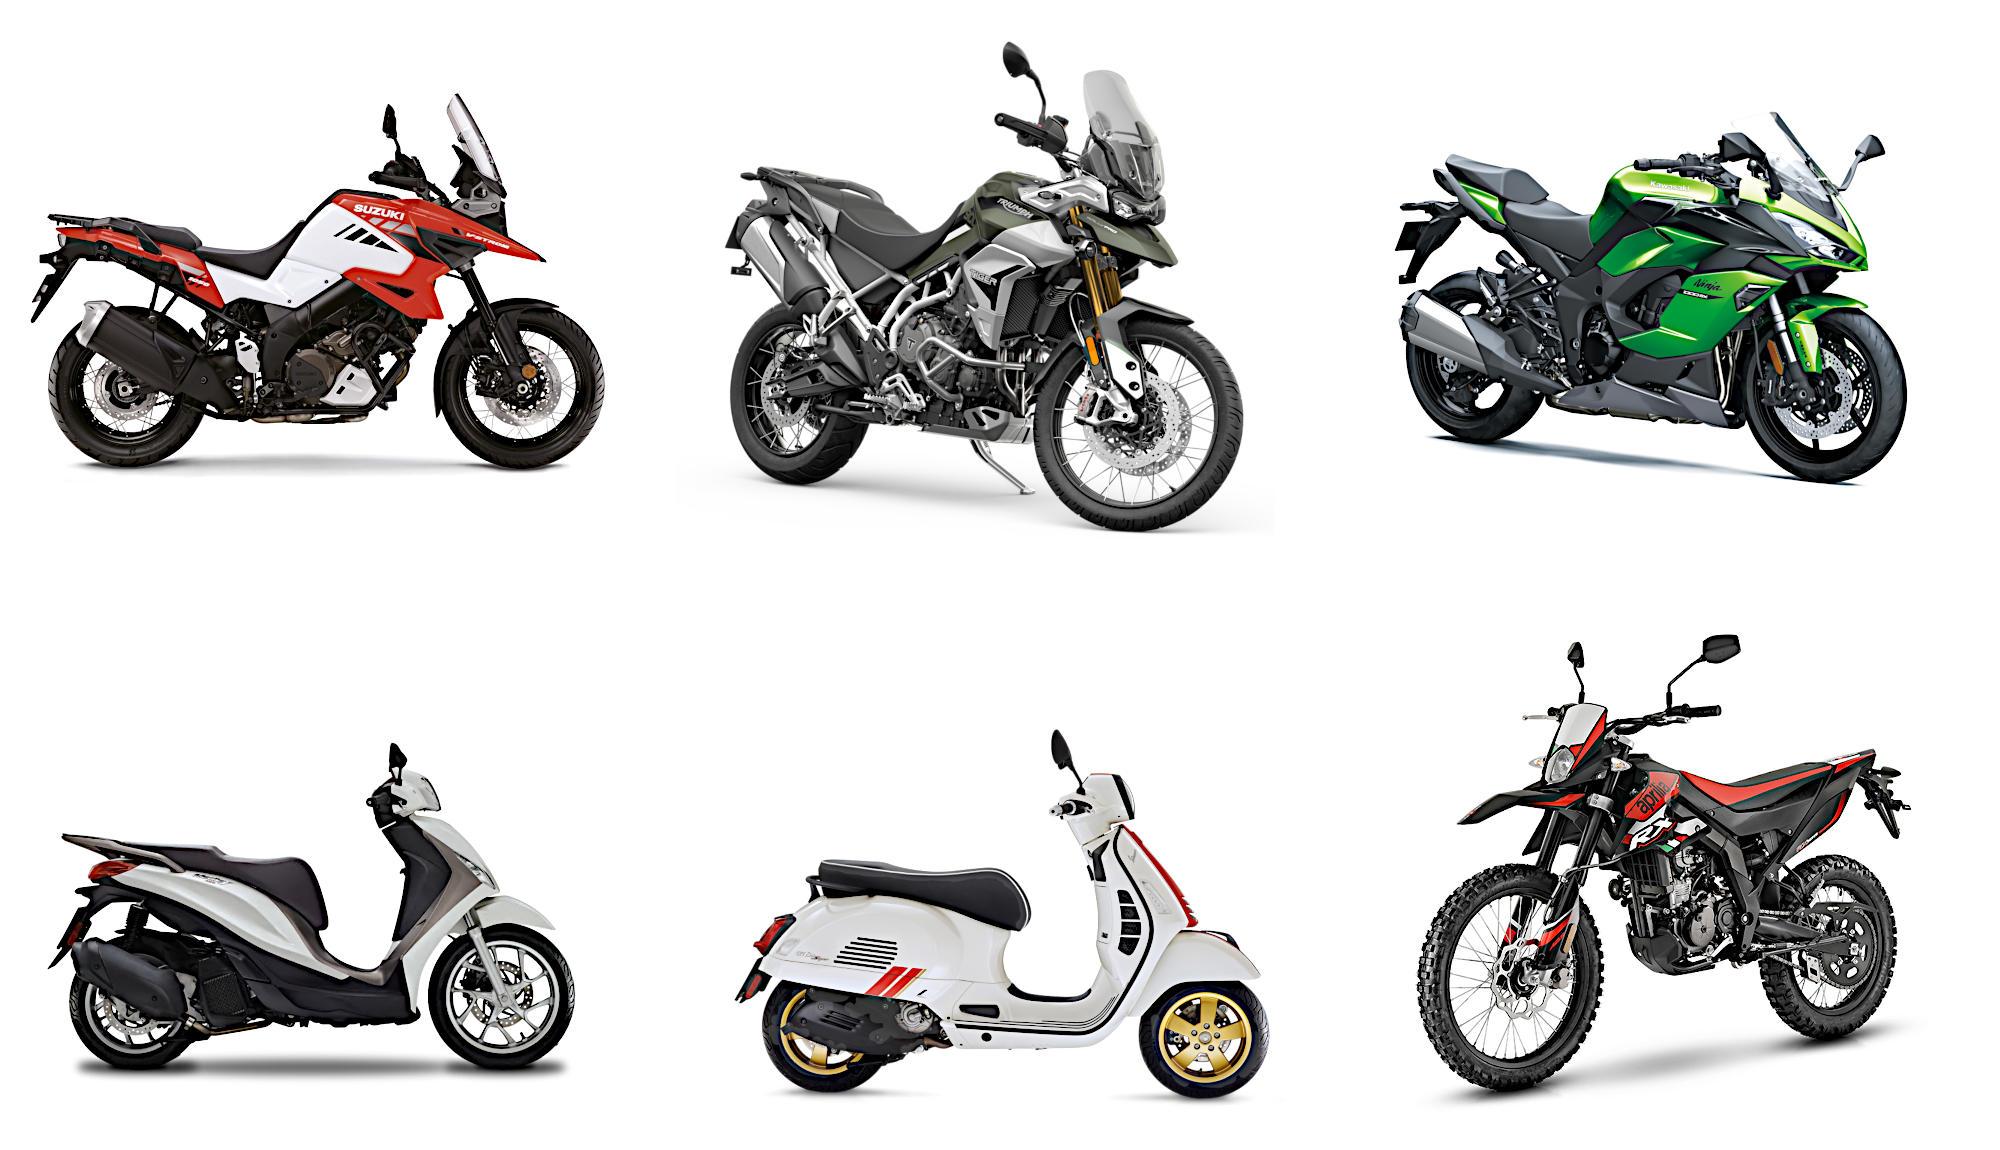 Neufahrzeuge: Suzuki, Triumph, Kawasaki, Piaggio, Vespa und Aprilia